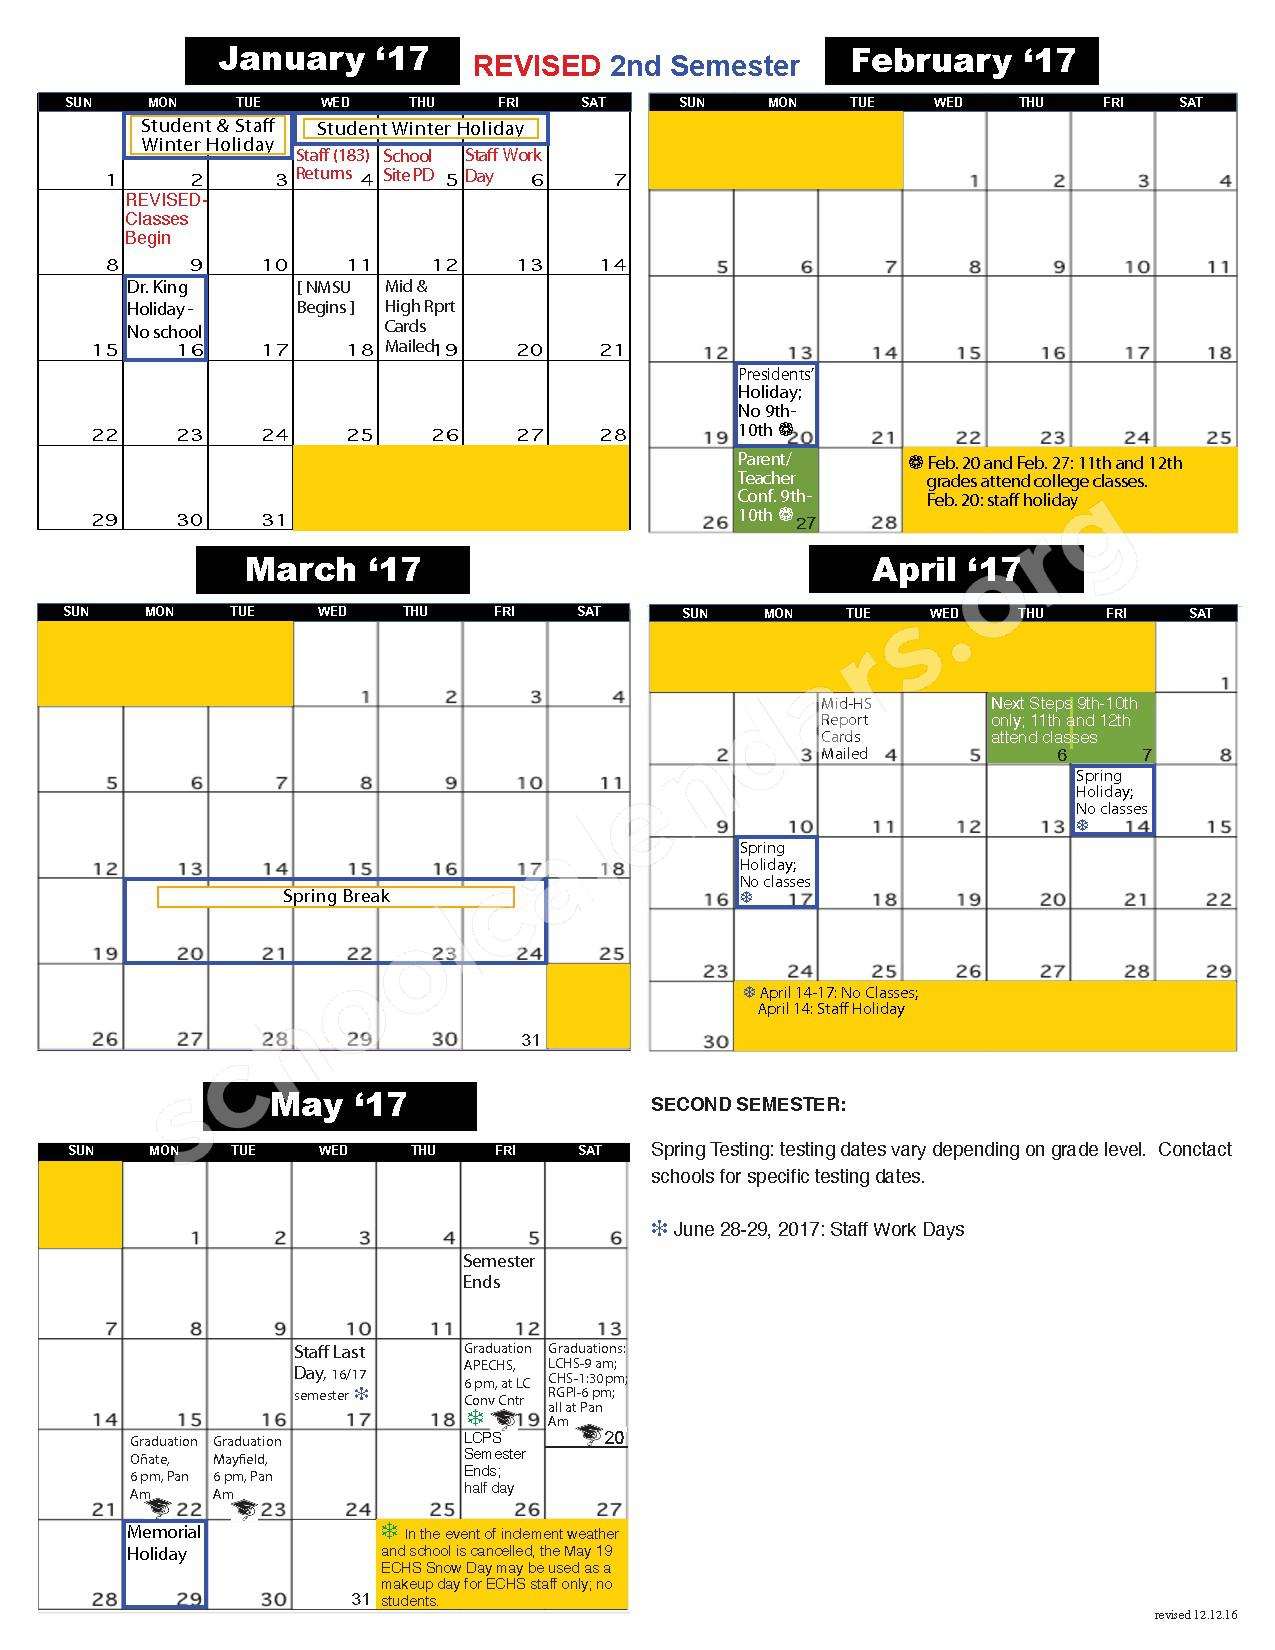 Las Cruces Ps Calendar | Printable Calendar 2020-2021 pertaining to Nc Court Calendar Search By Name